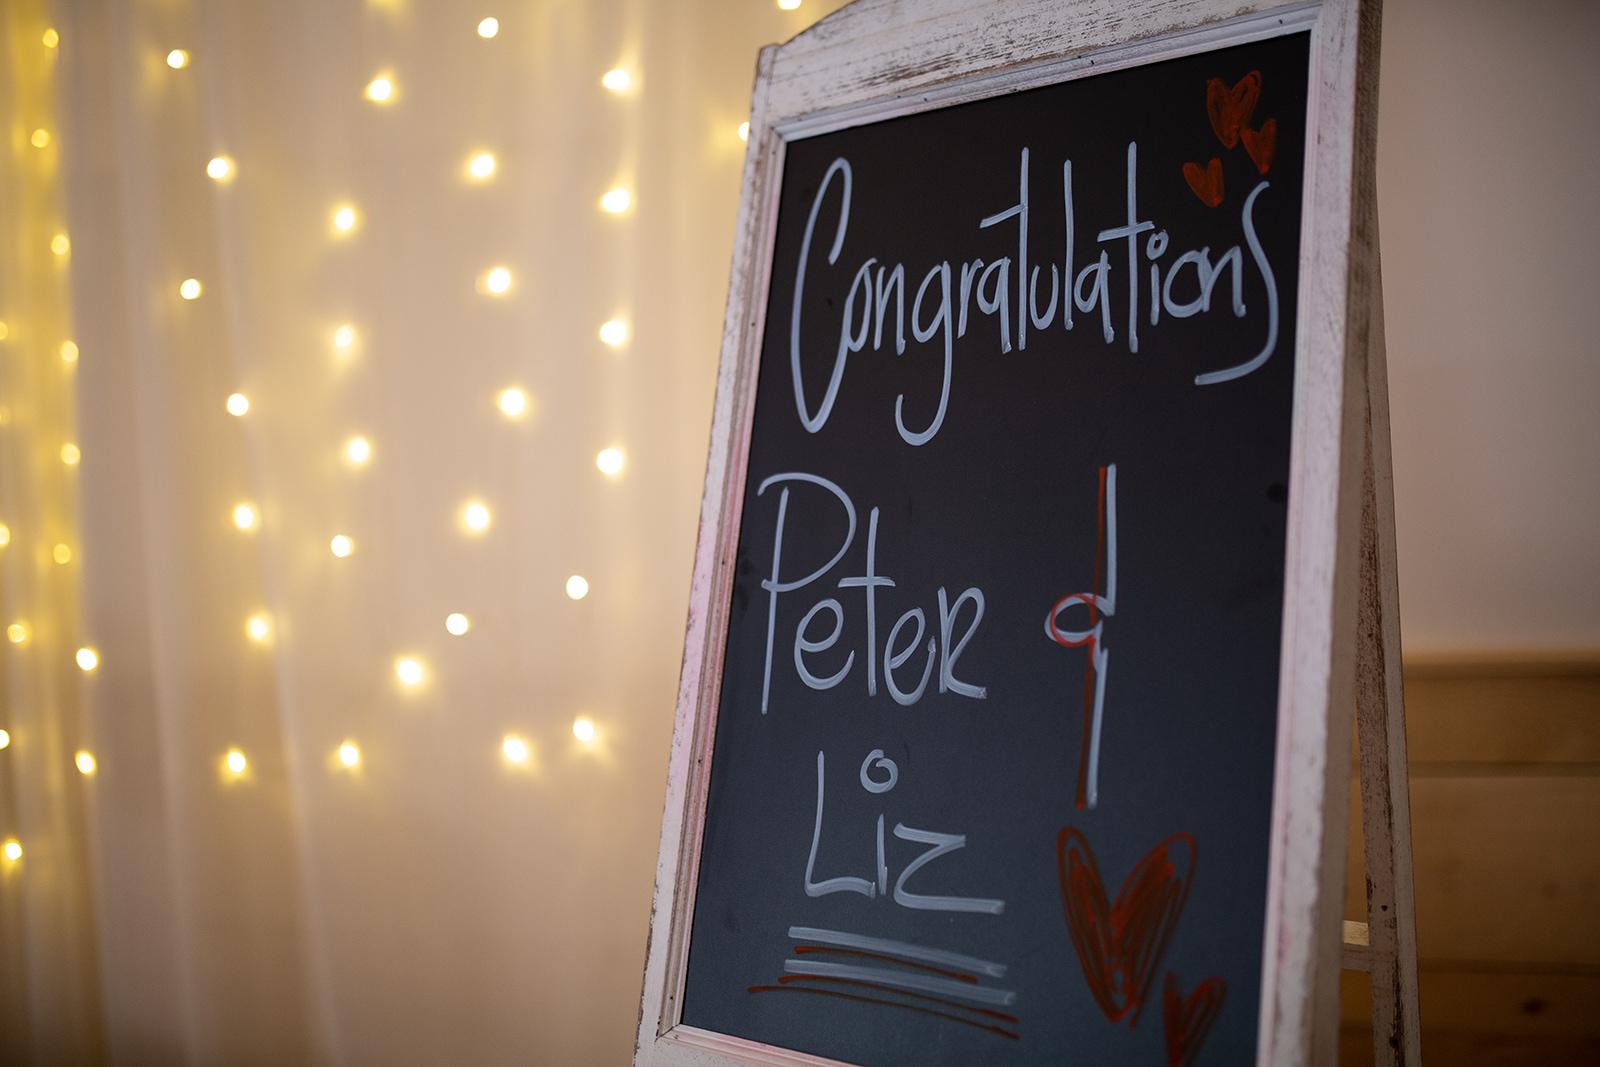 Peter and Liz-4795.jpg